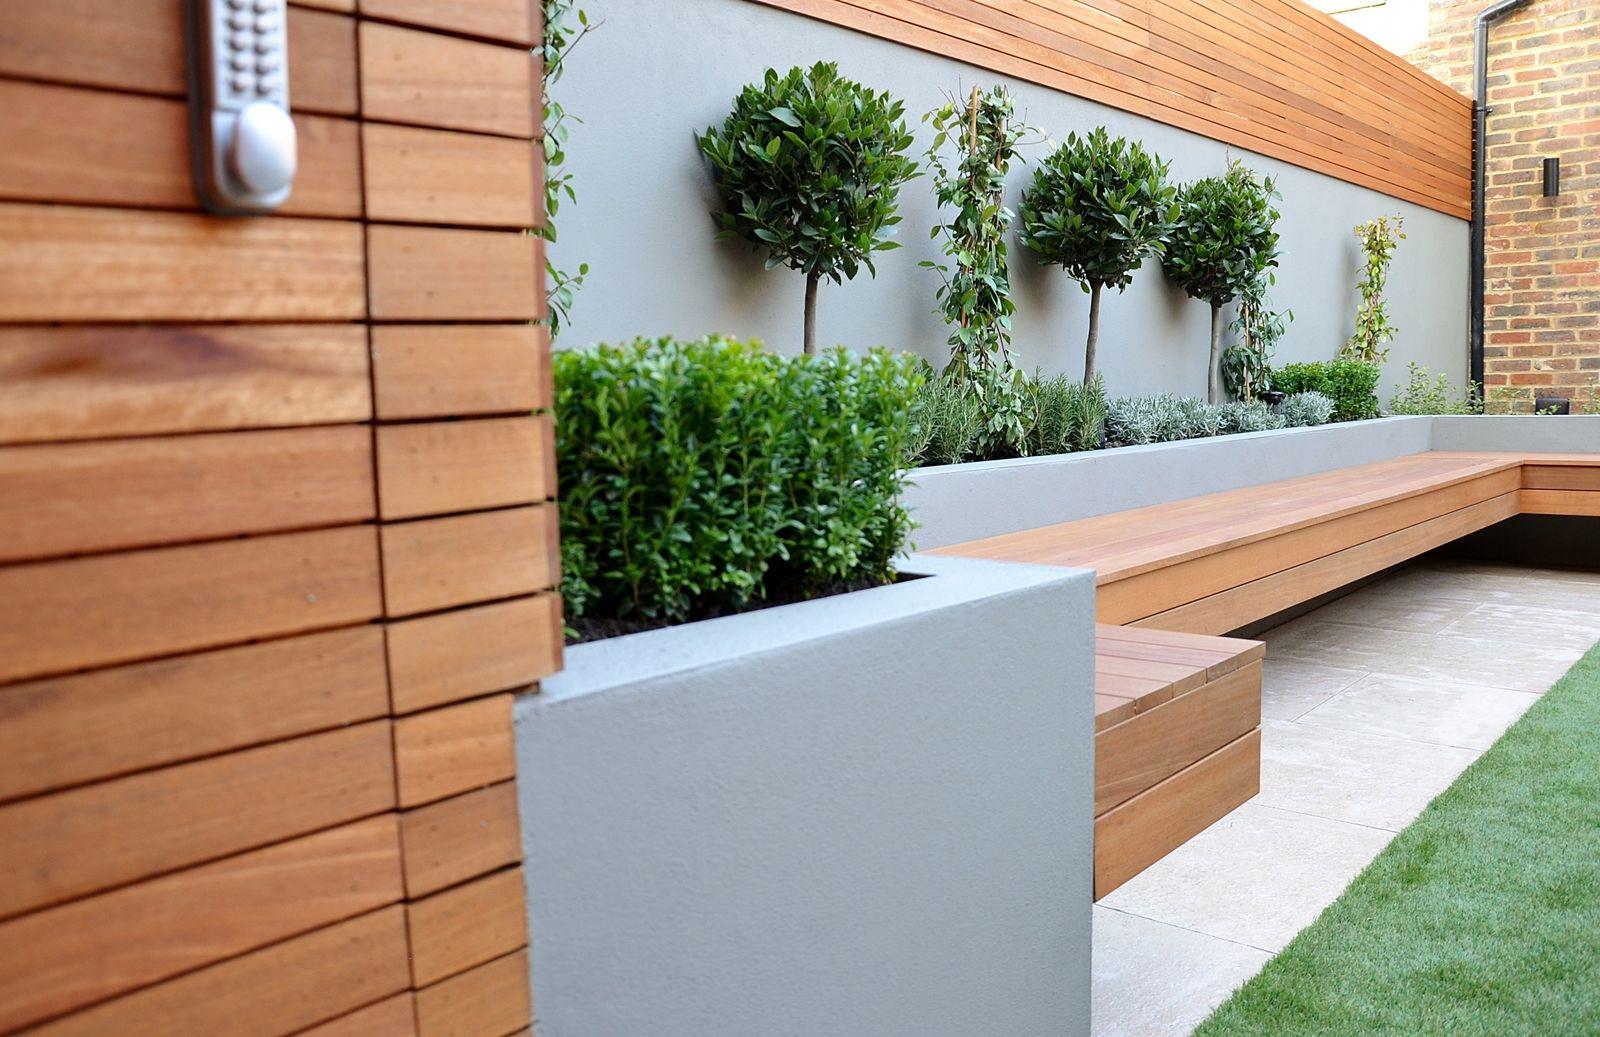 Bespoke Storgae In Hardwood Slats Raised Beds Render Block Walls Bench In  Hardwood Garden Designer London Pool Garden Bed Onto Deck